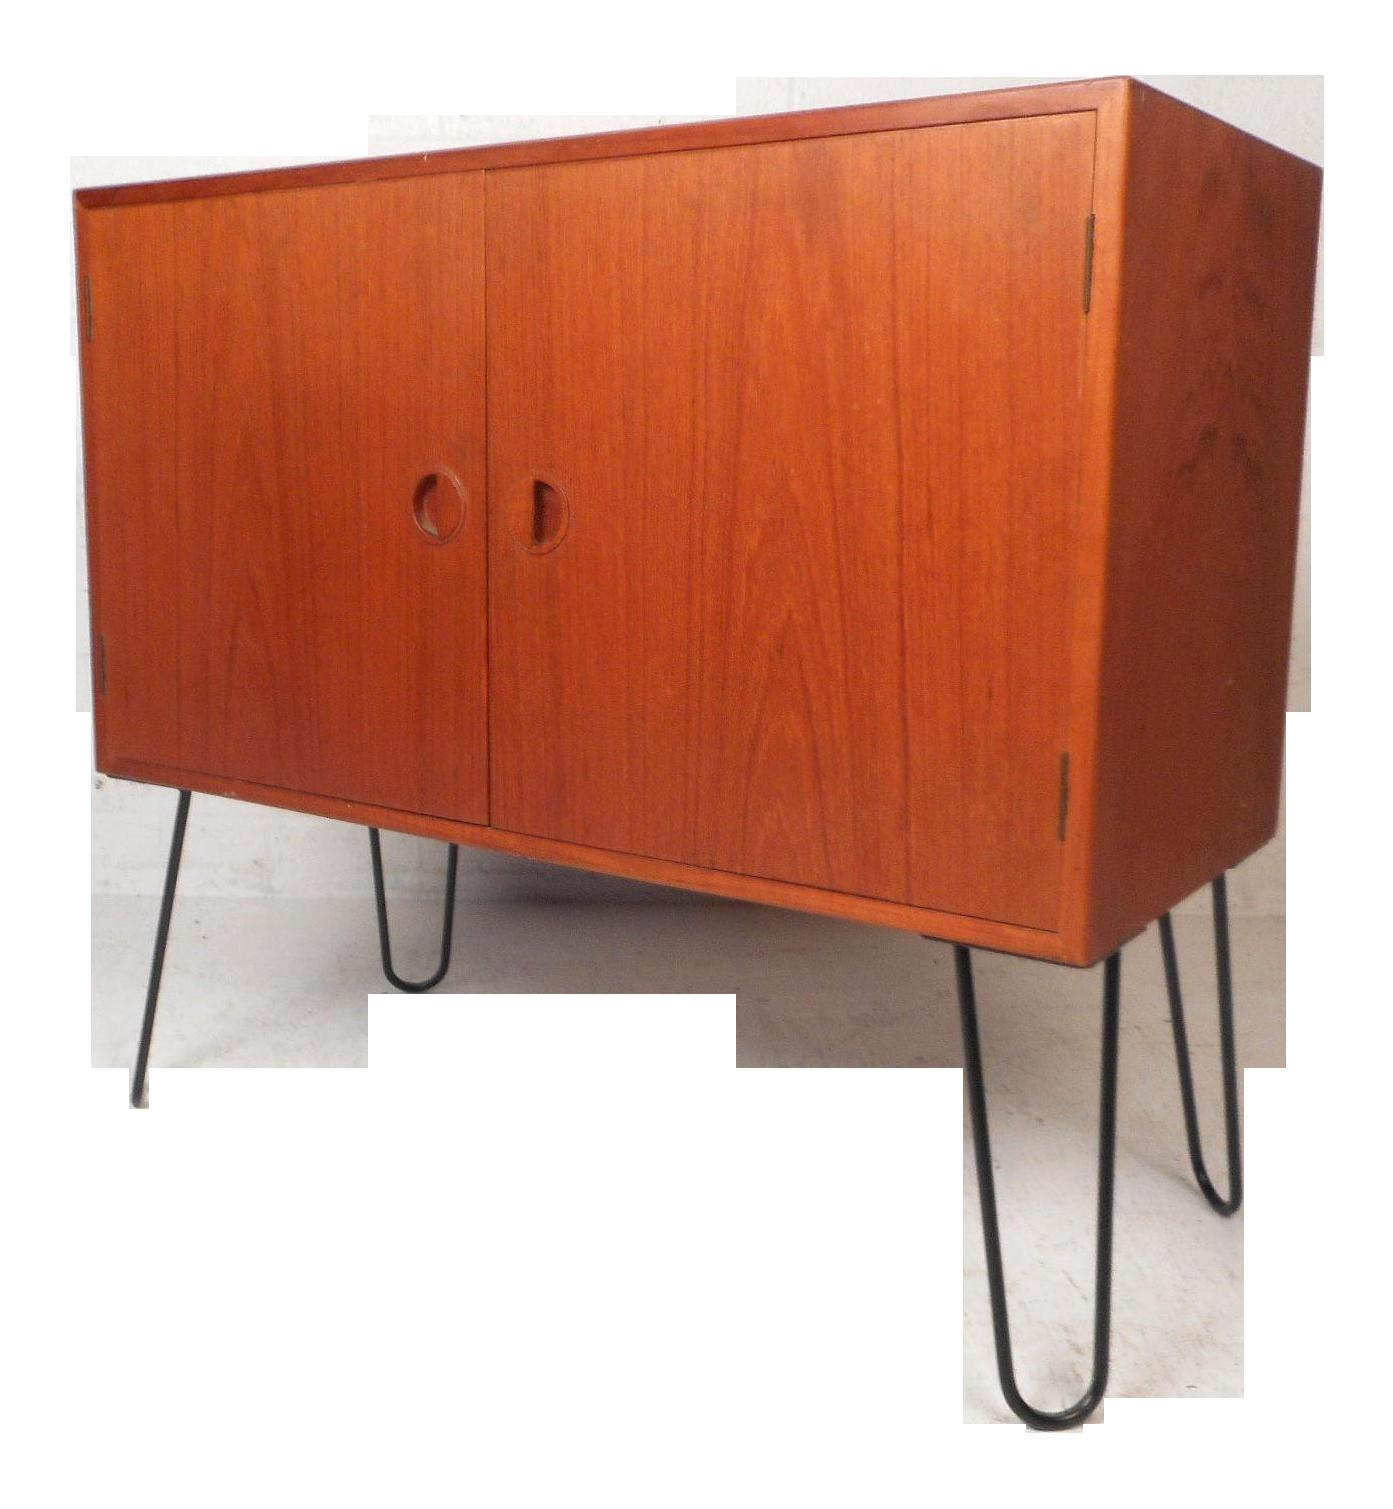 Mid Century Modern Danish Teak Cabinet With Hairpin Legs